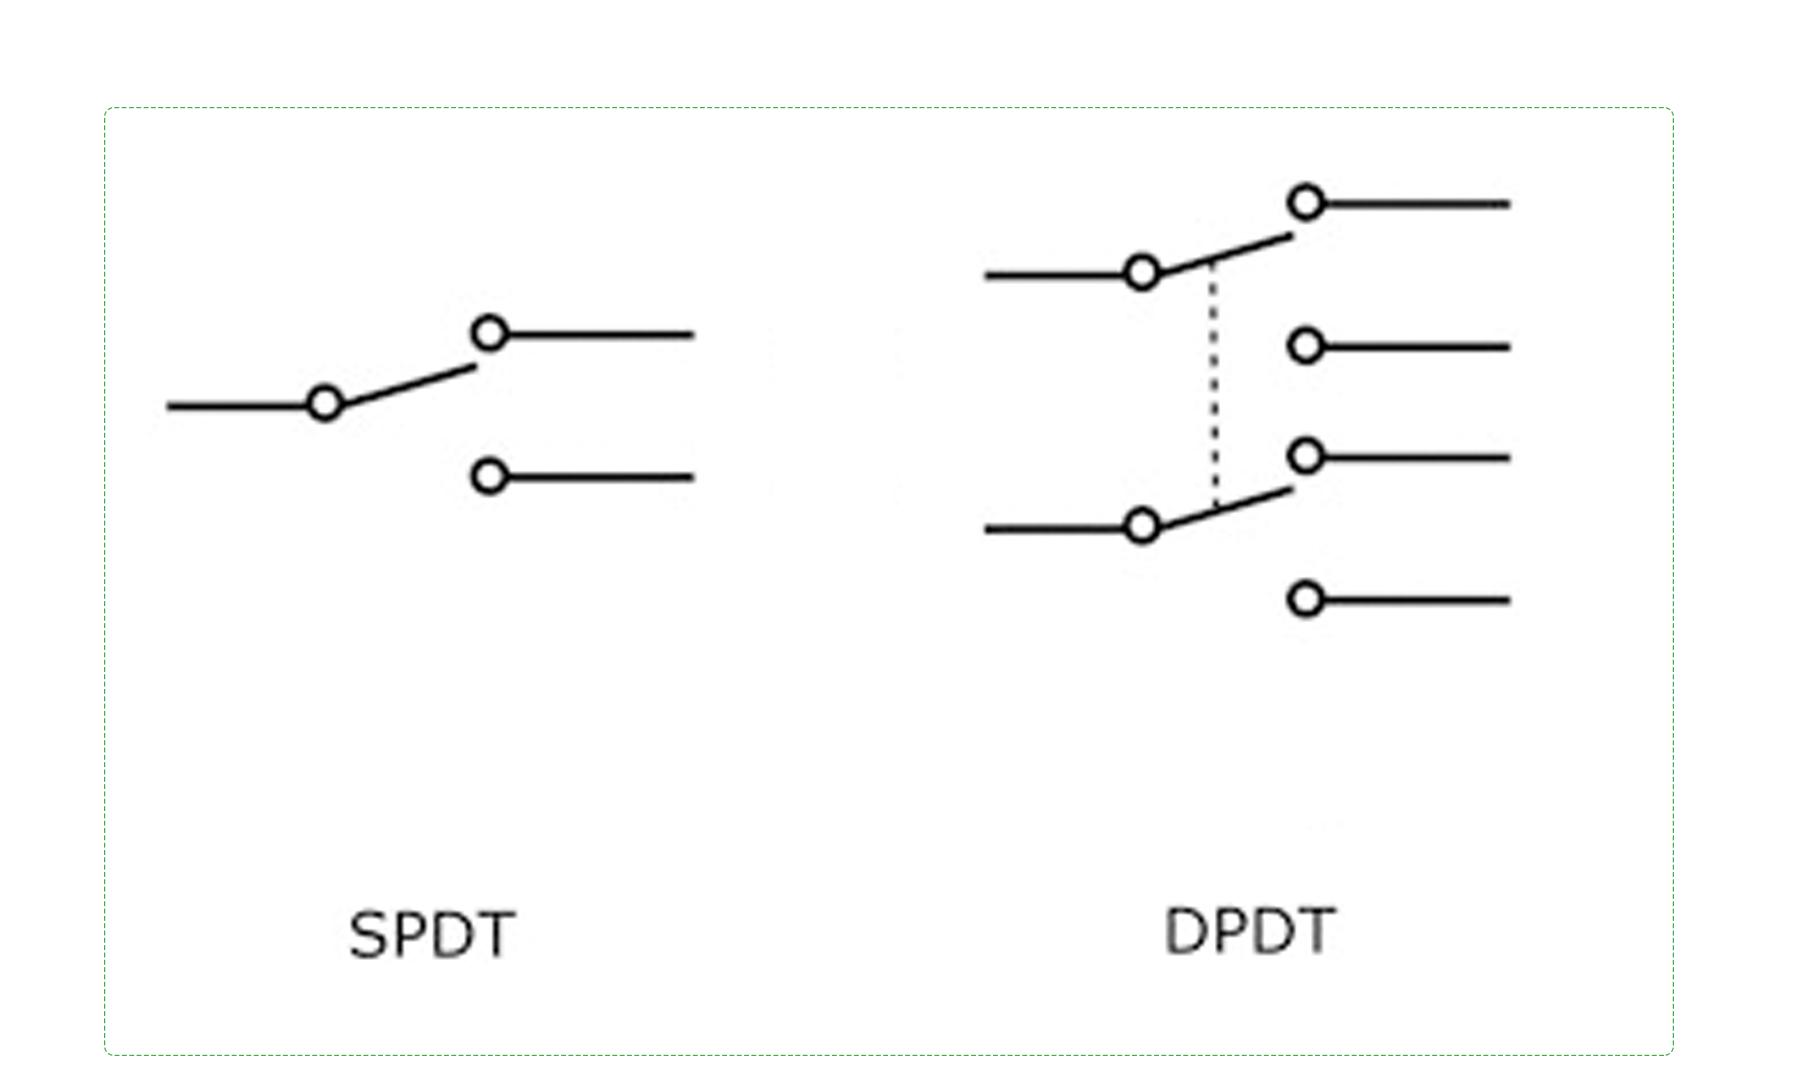 configuration rjs electronics ltd, SPD, DPDT, RJS Electronics Ltd